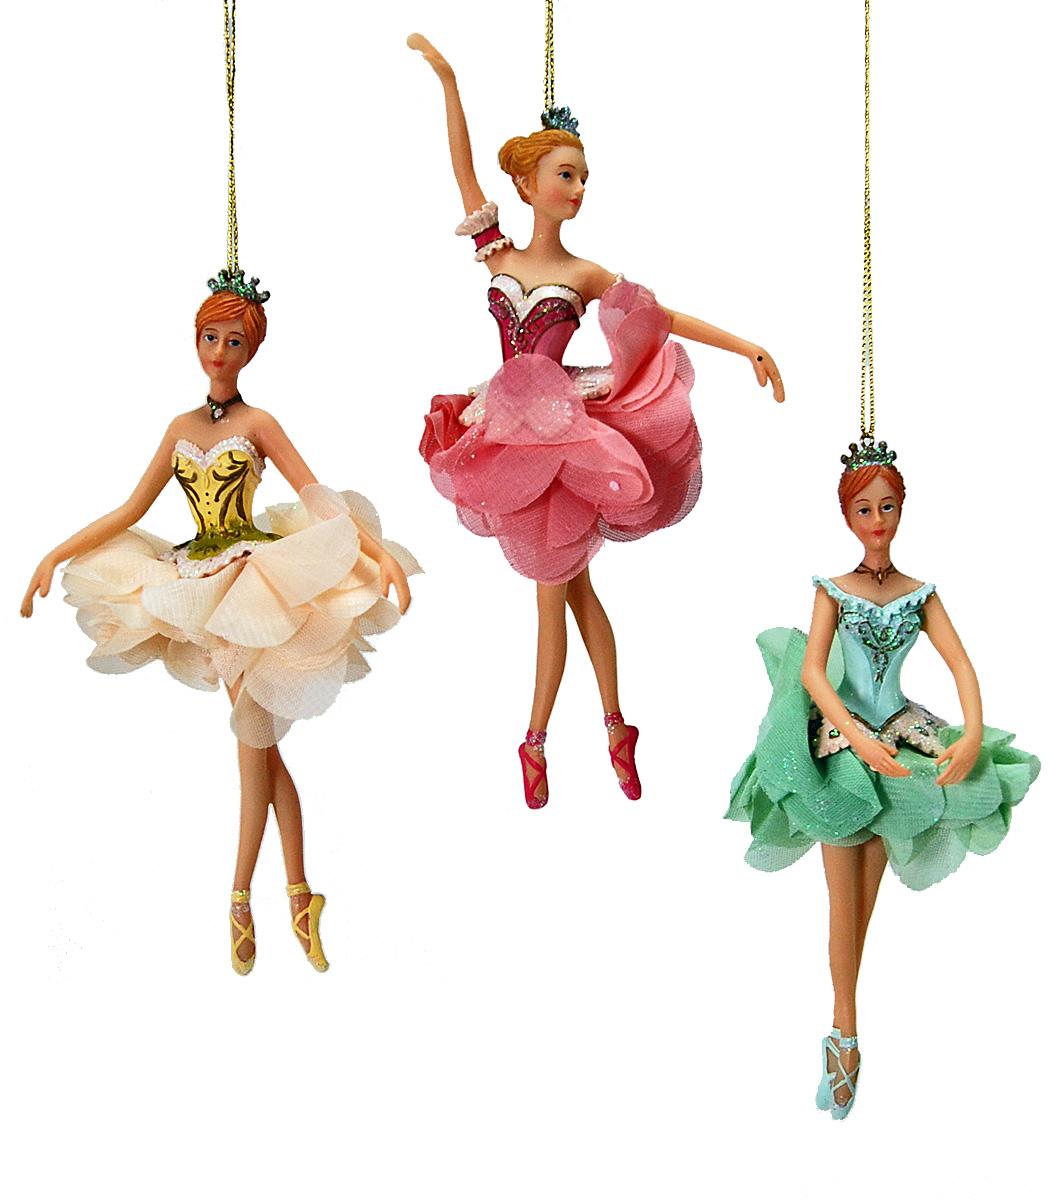 Pirouette Ballerina Ornament - Assortment Of 3  22-524708